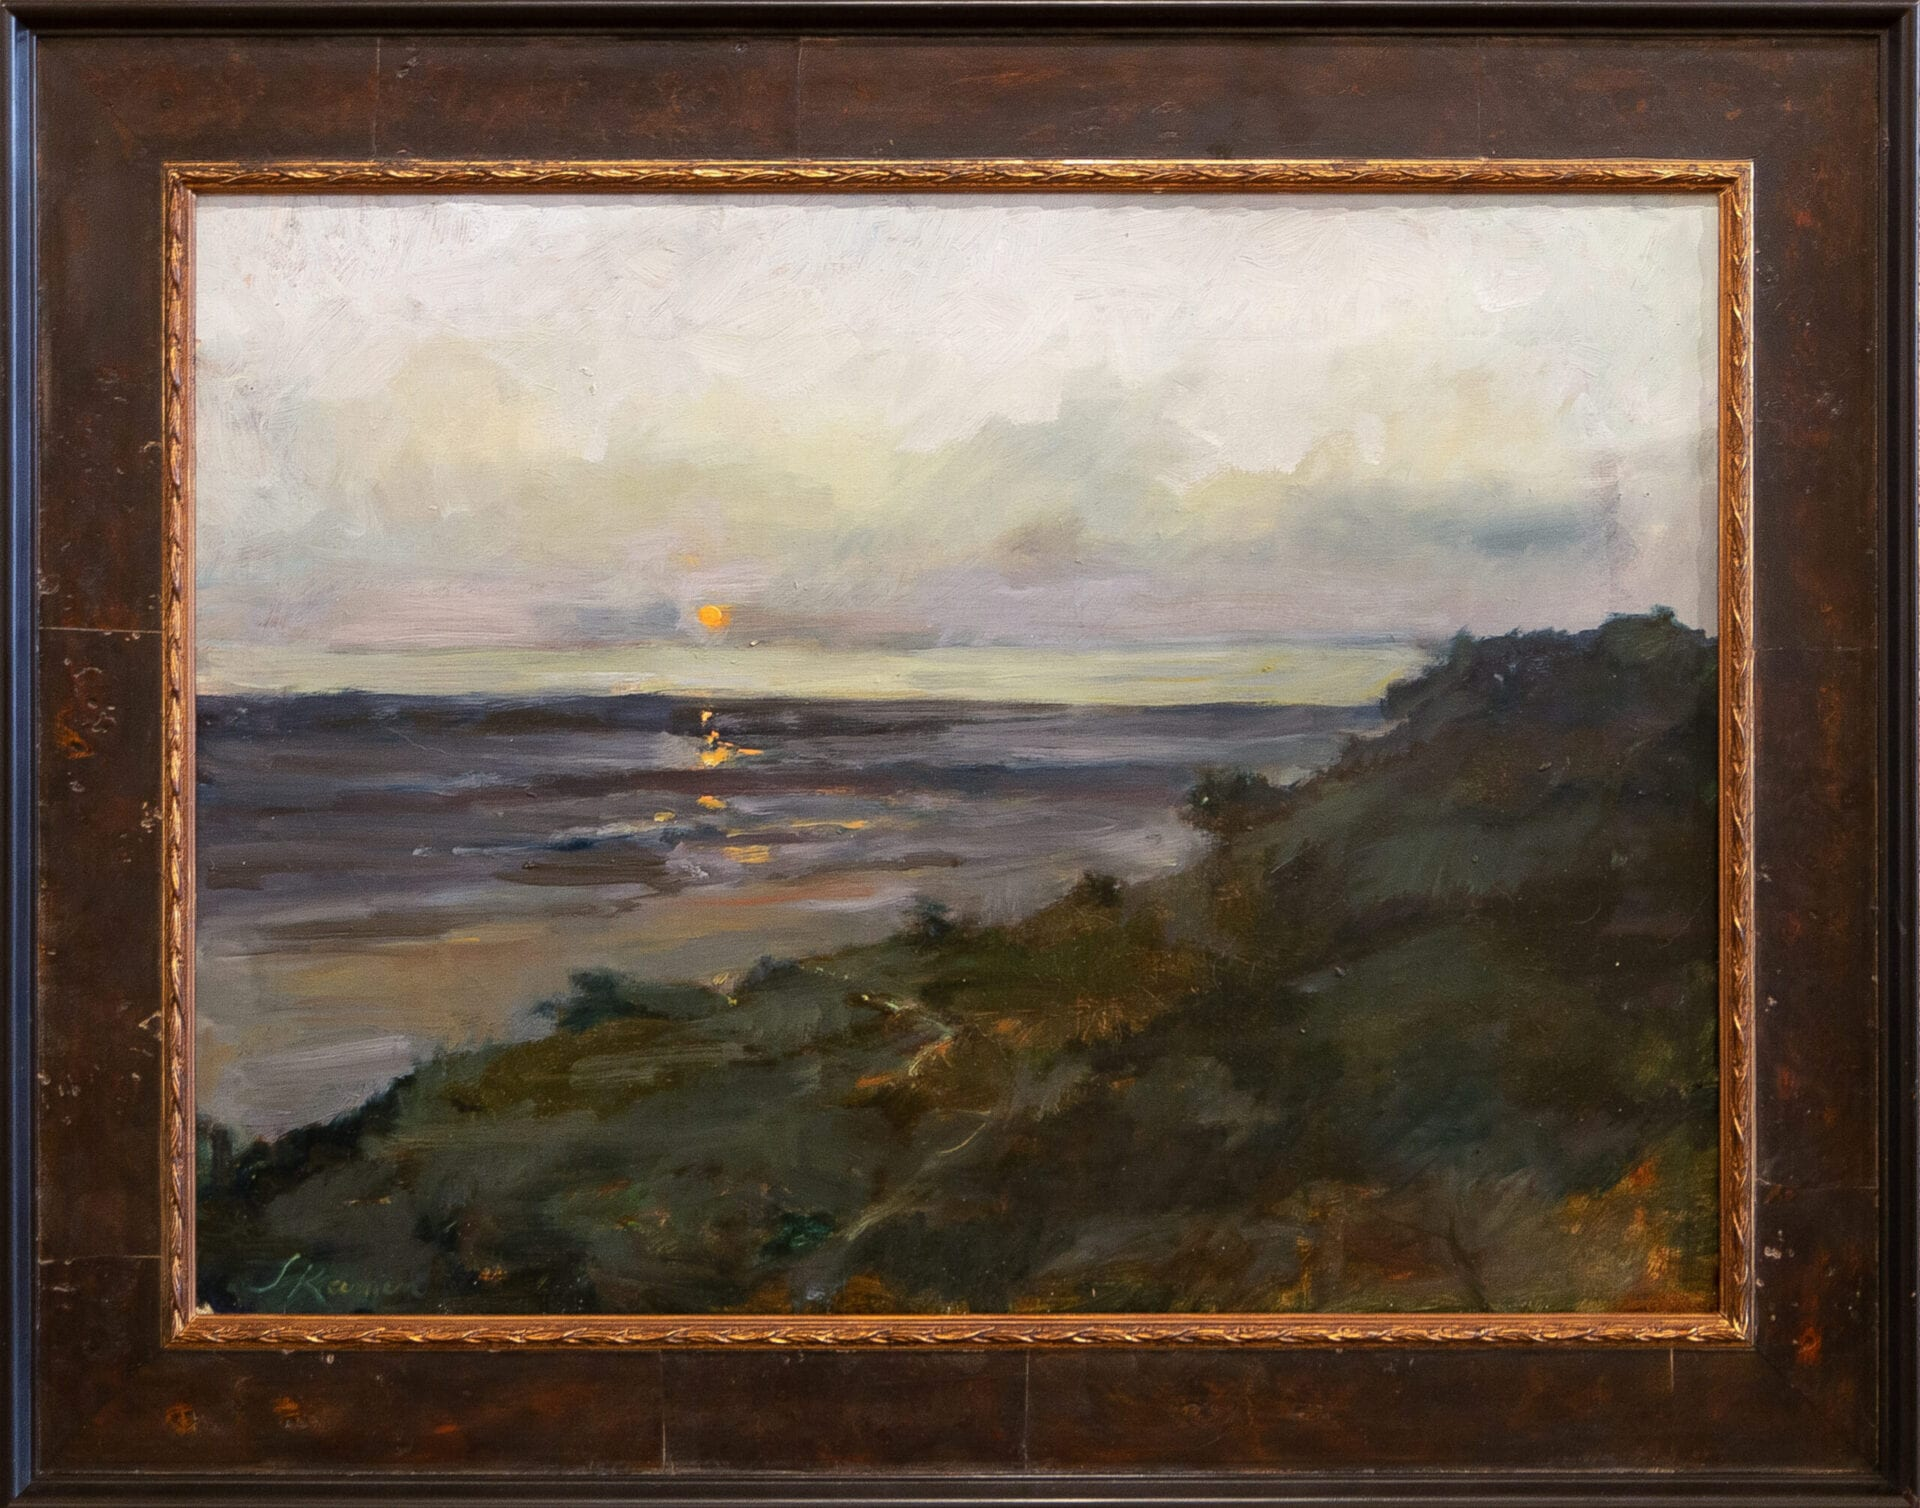 "Beach at Sunset   Jacqueline Kamin   Oil on Panel   17.75 x 24"""